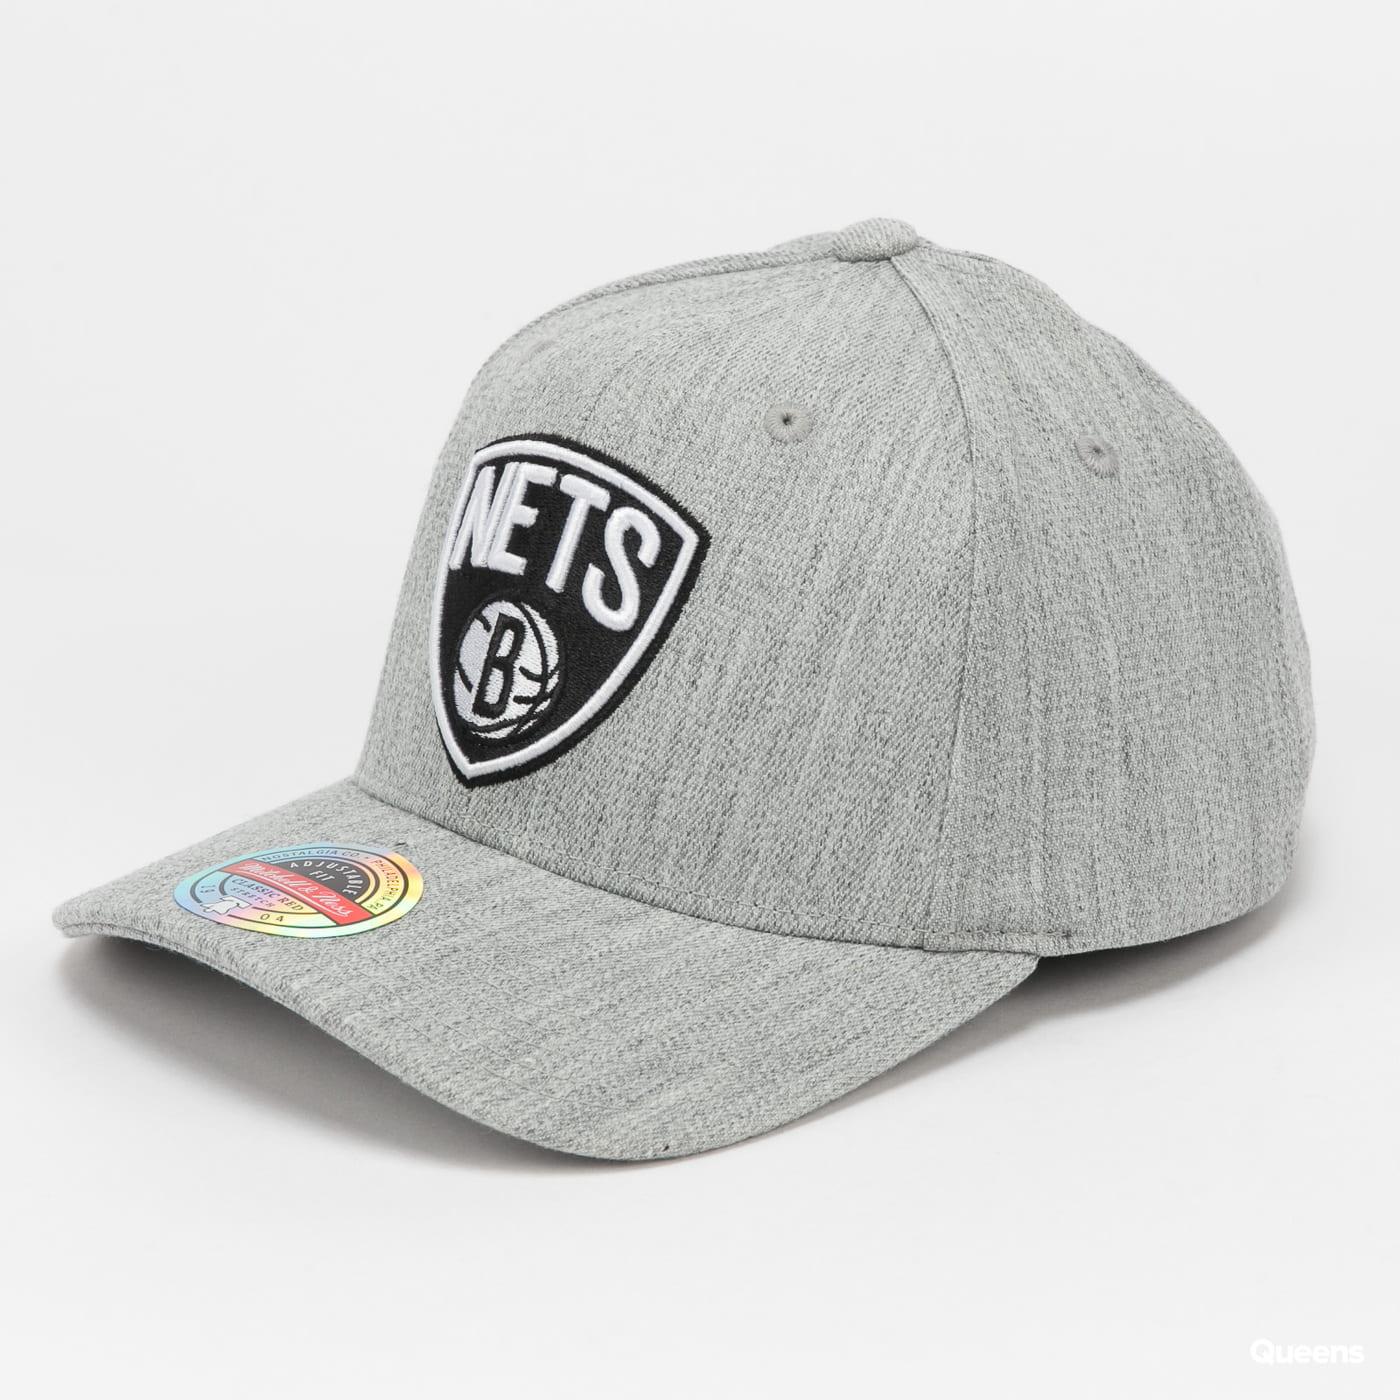 Mitchell & Ness NBA Team Heather Snapback Nets melange gray